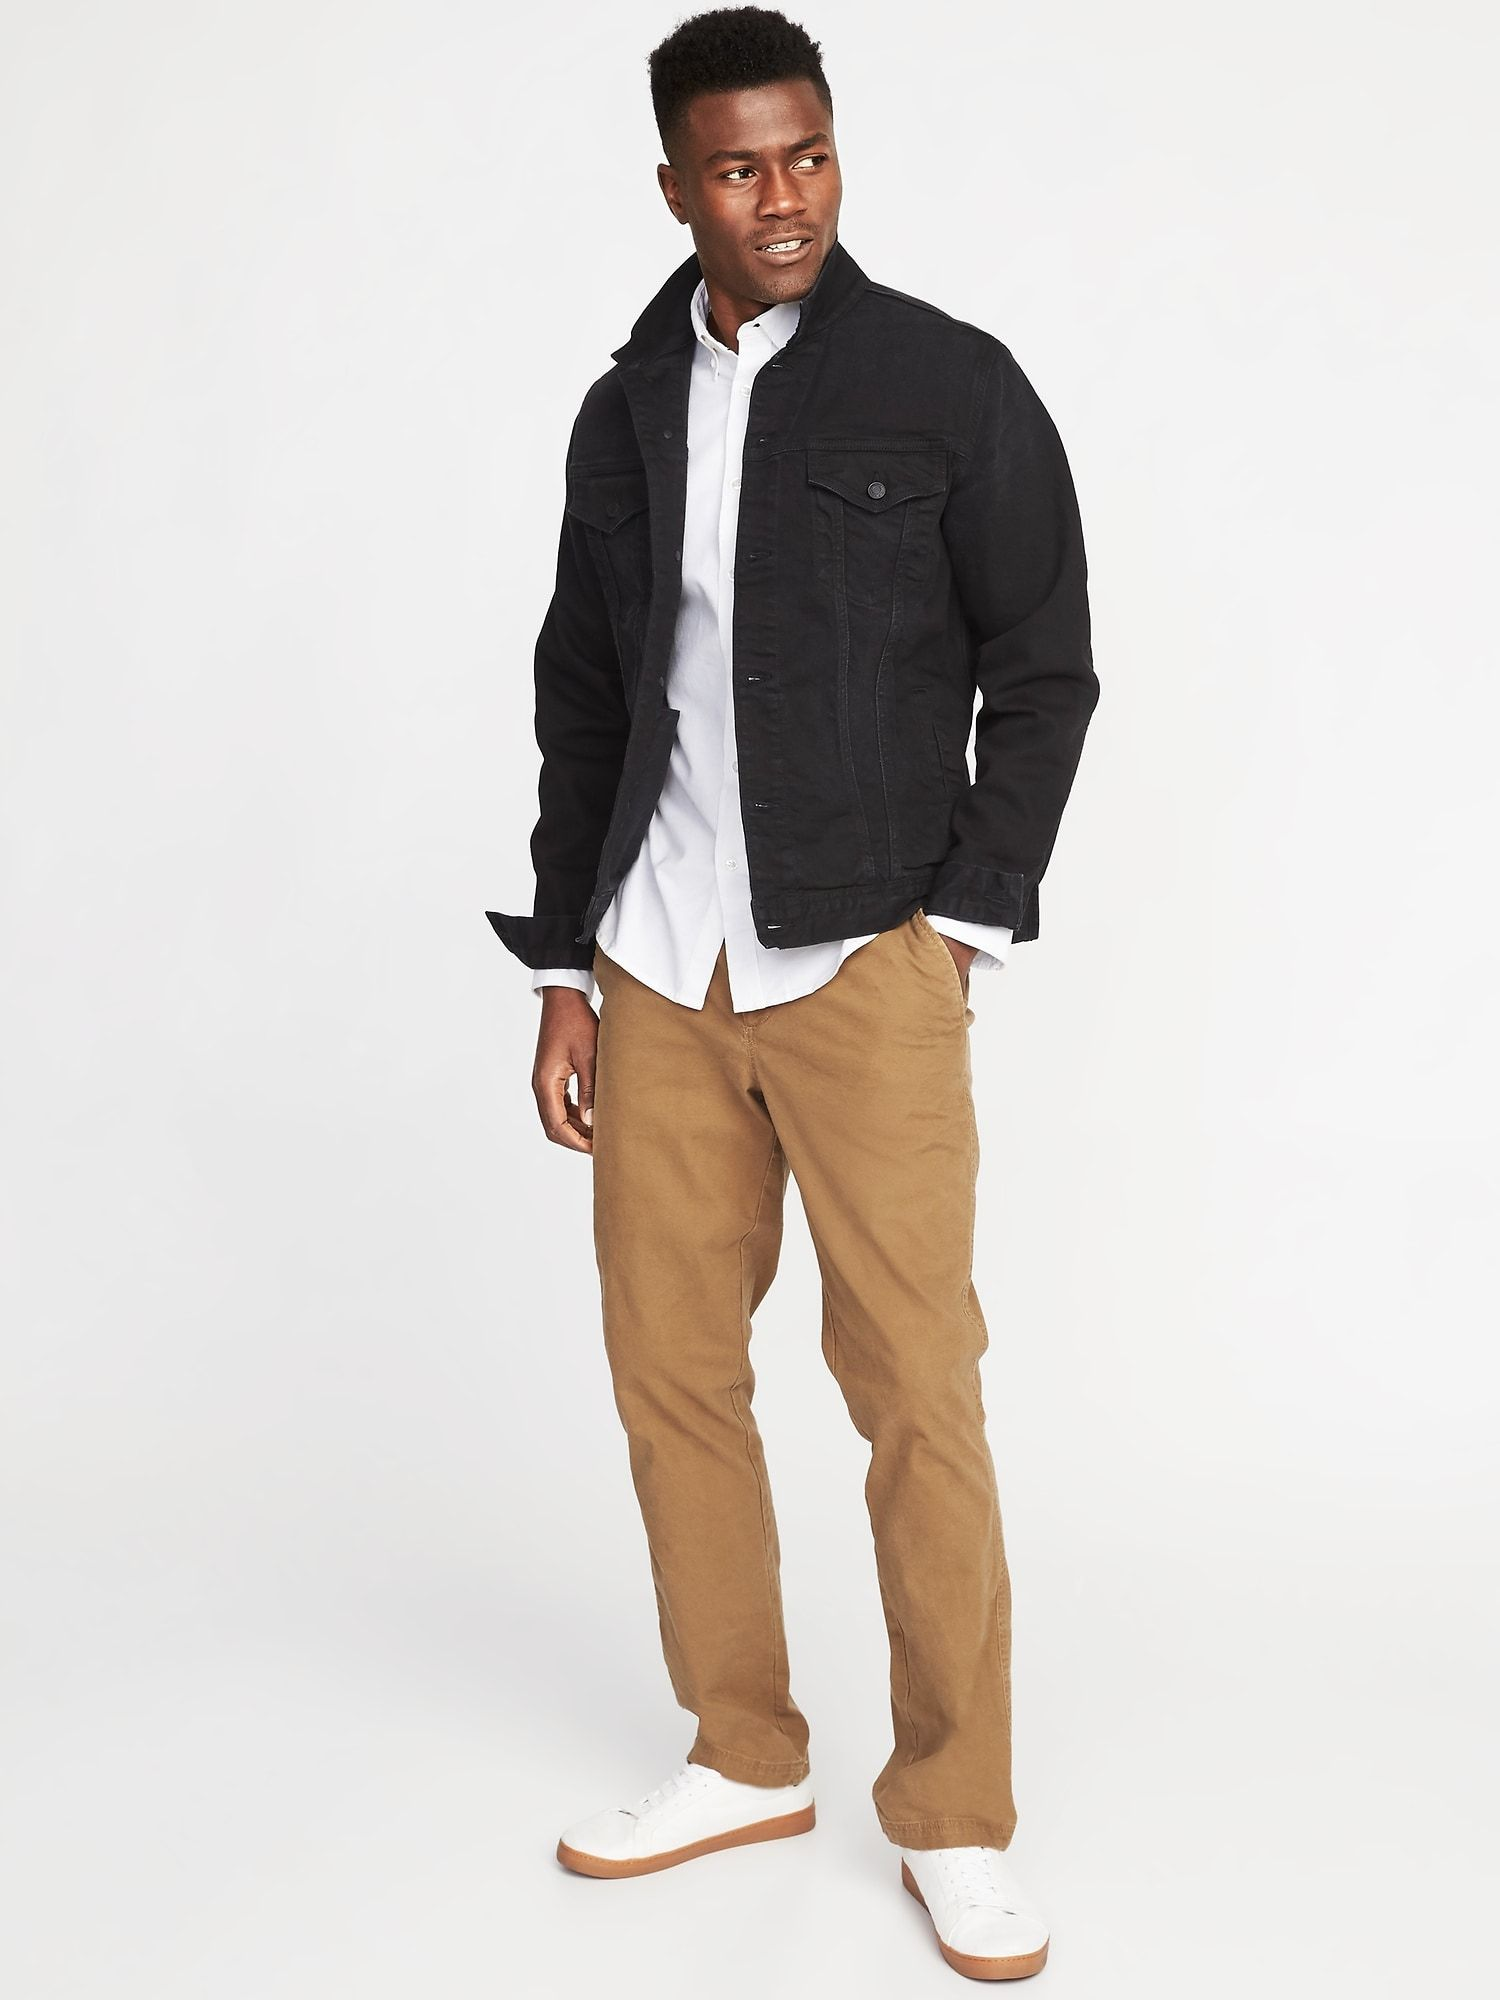 Product Black Tee Men Denim Jacket Men Mens Jackets